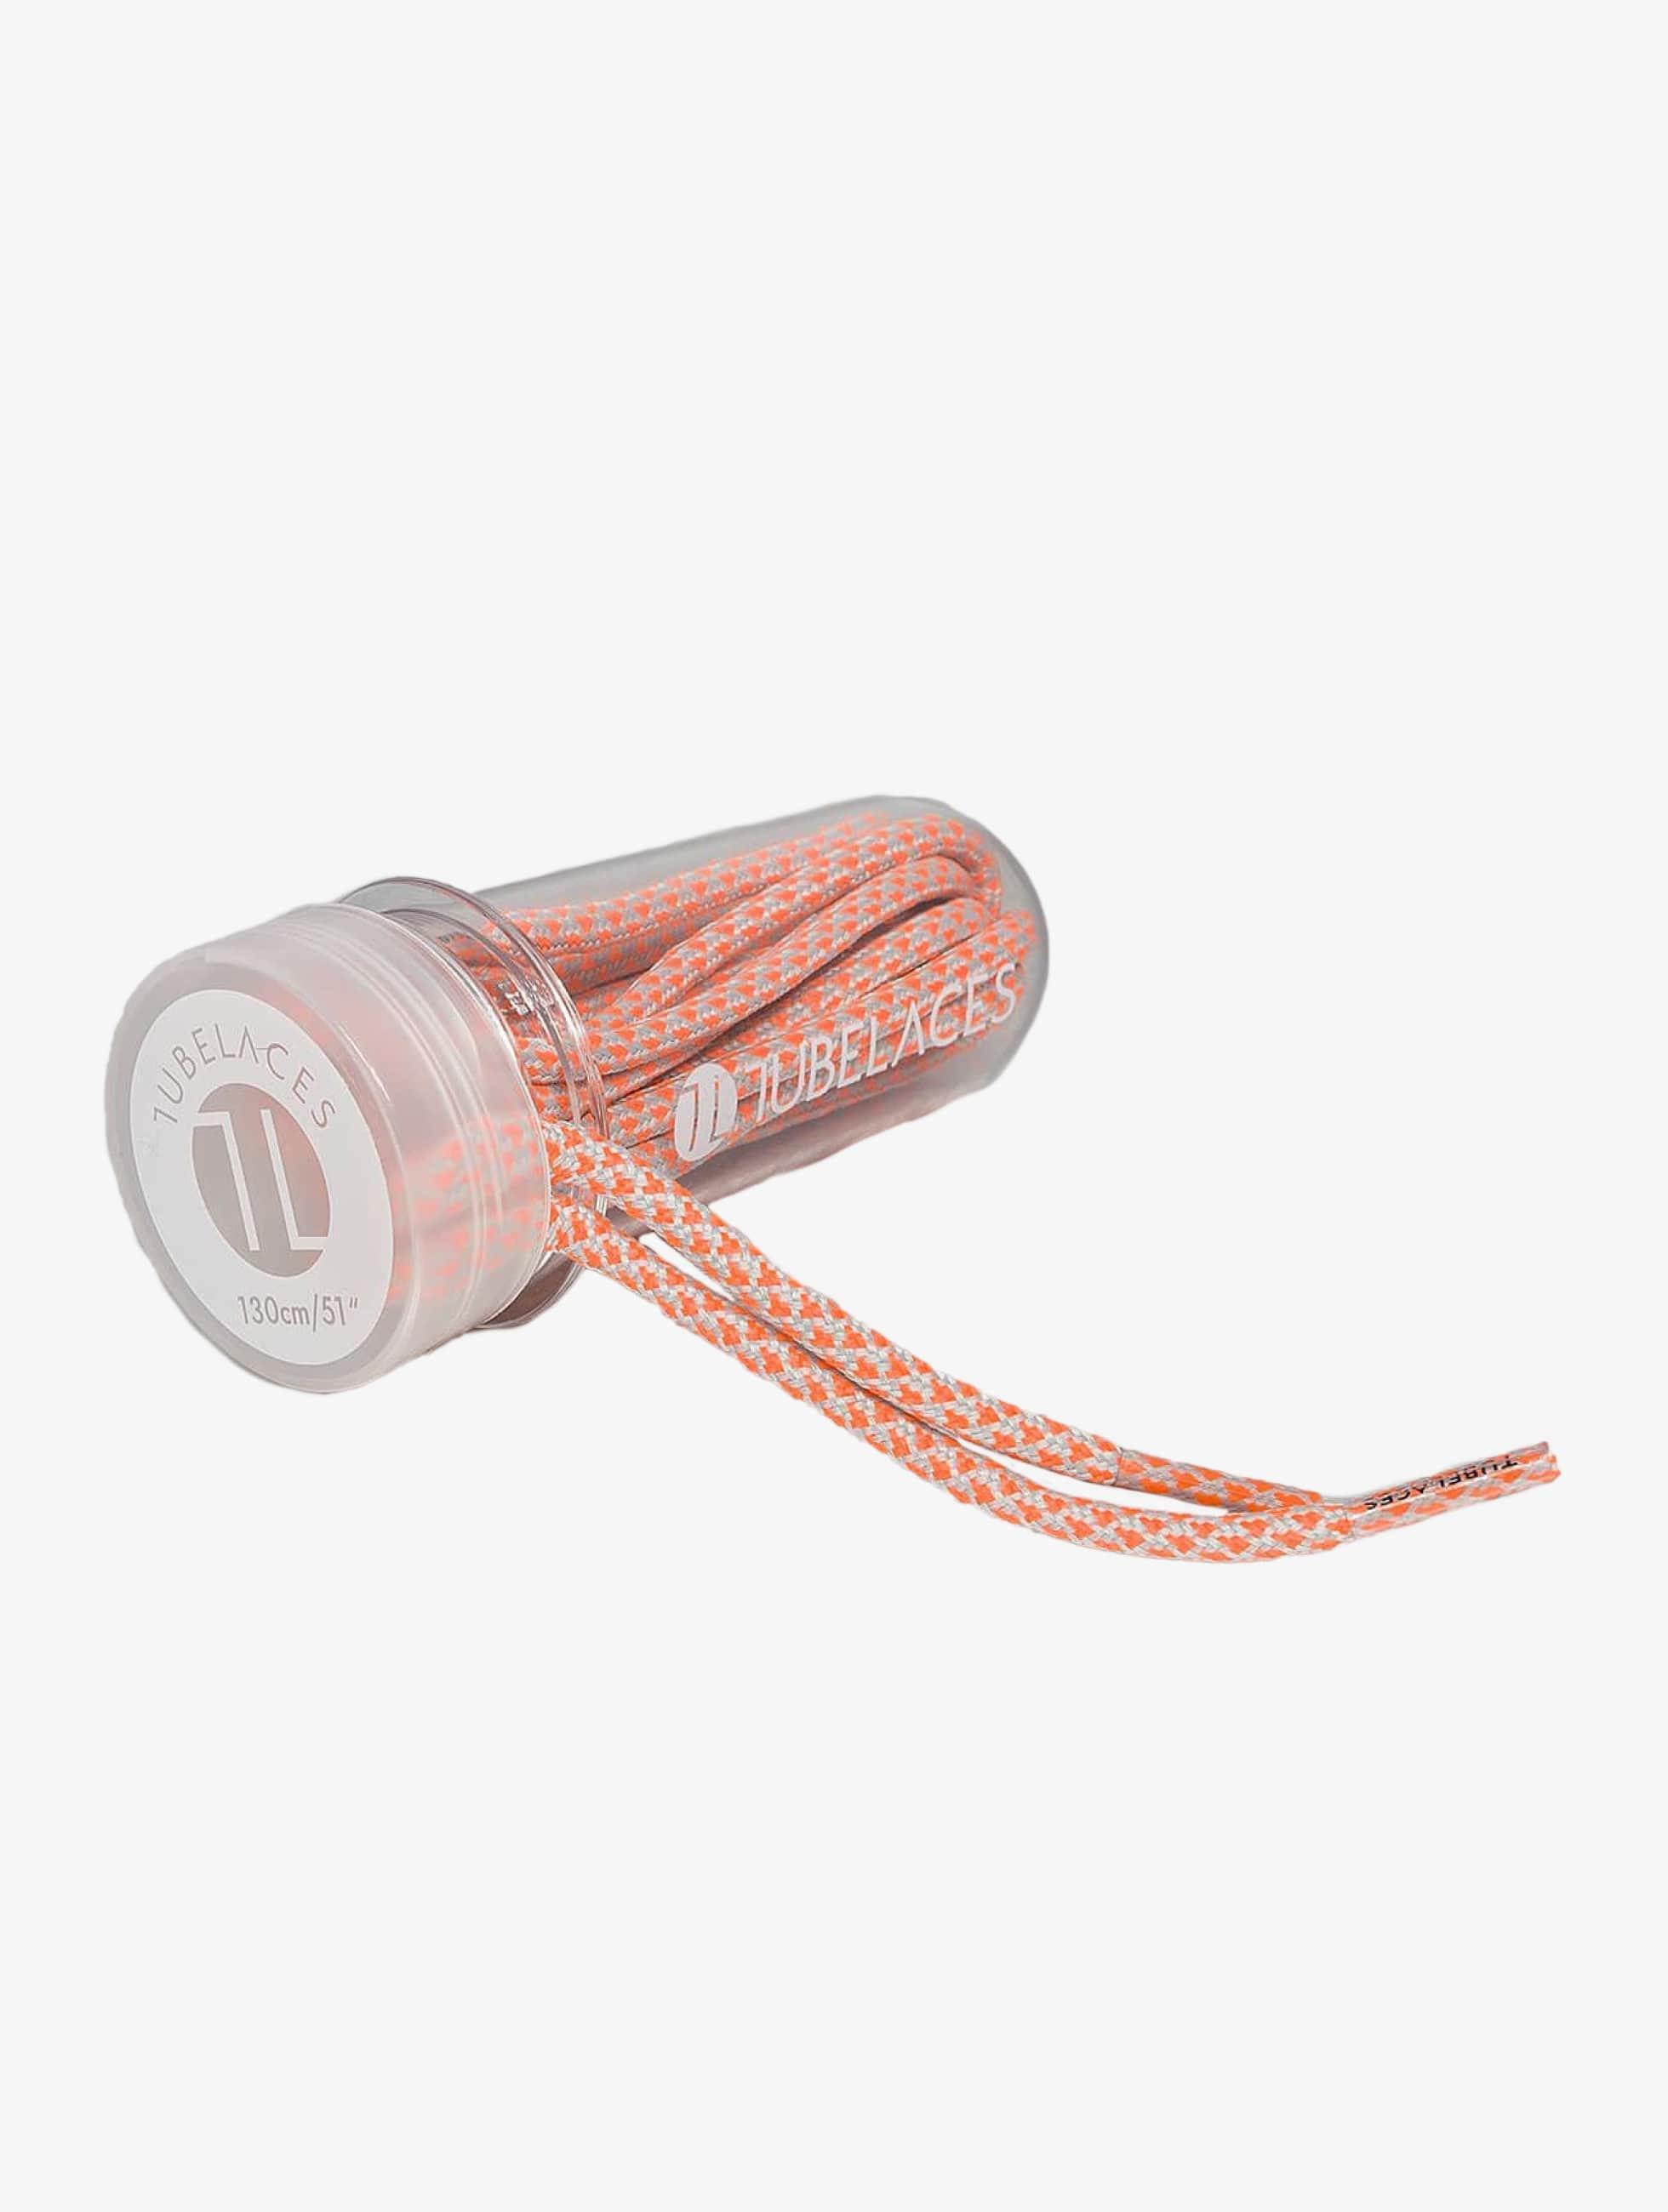 Tubelaces шнурки Rope Multi оранжевый